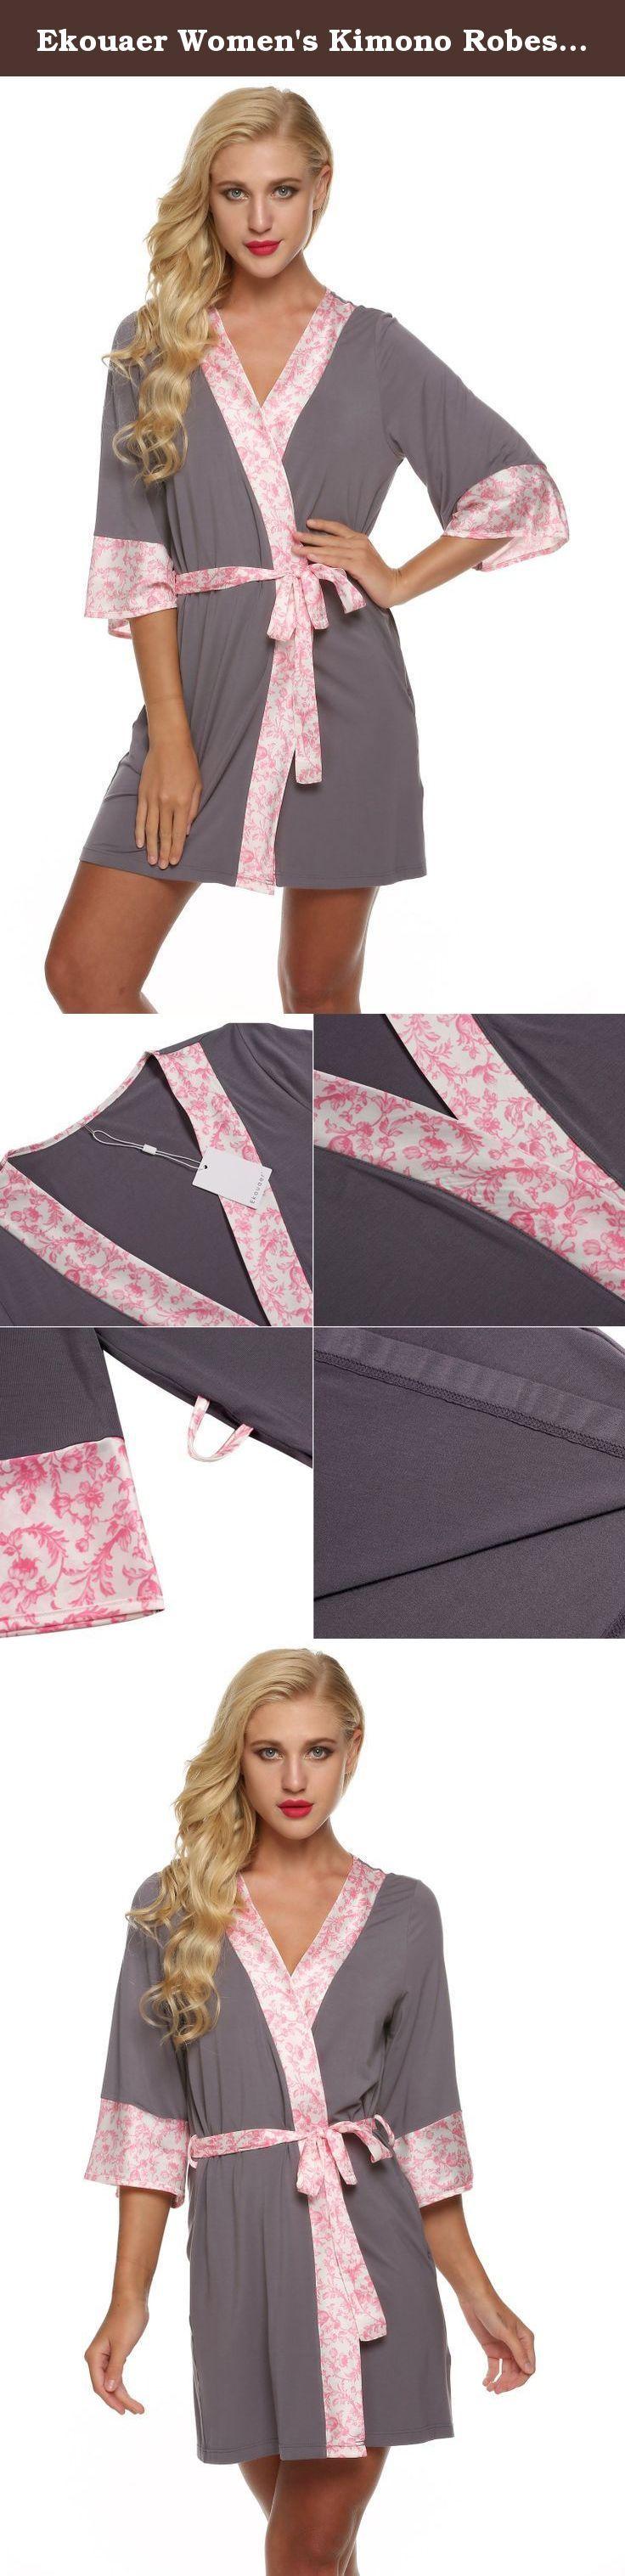 Ekouaer Women's Kimono Robes Lightweight Nightwear Short Style Sleepwear (Gray, Small). Ekouaer Robe Womens Kimono Bathrobes Lightweight Viscose Loungerwear Short (XS-XL) Eco-friendly Fabric: 95% Viscose+ 5% Elastane; Satin: 112%Polyester. Three quarter-sleeve robe featuring kimono collar^right on-seam pockets^inne ?????? ?? ?????? ??P ?????? ?? ?????? ??P ??????.